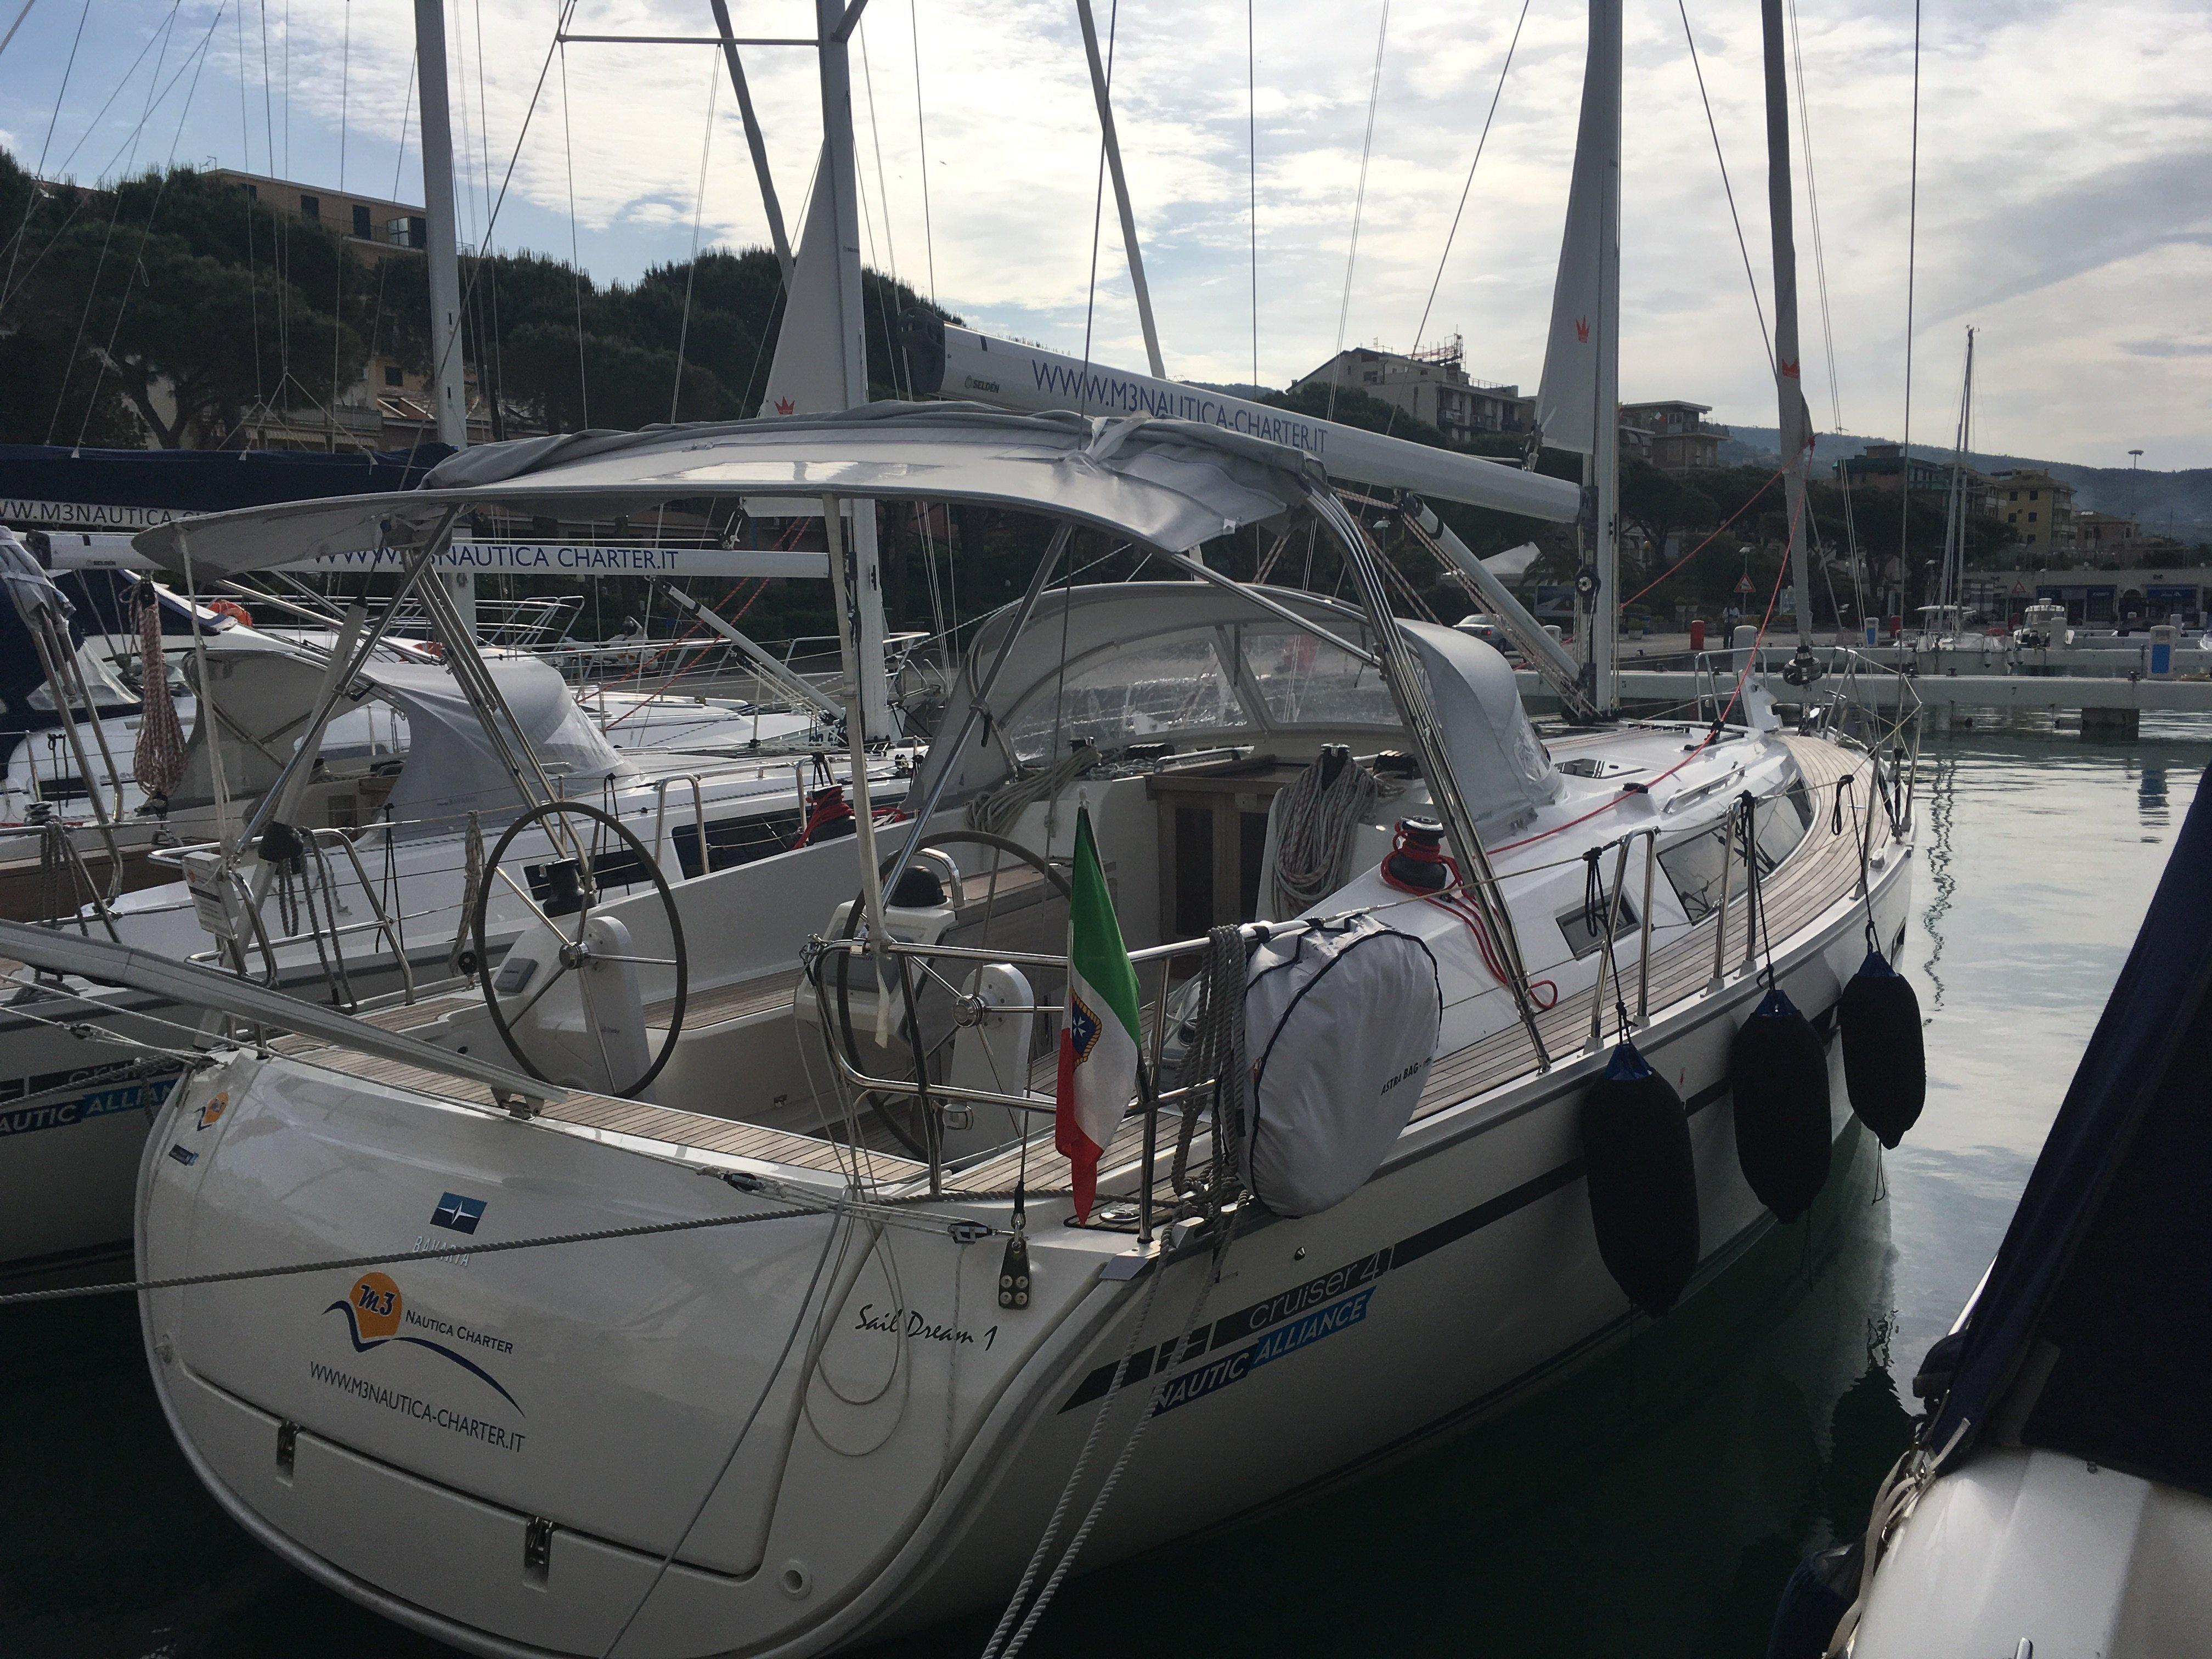 Bavaria Cruiser 41 (Sail Dream 1) Main image - 0